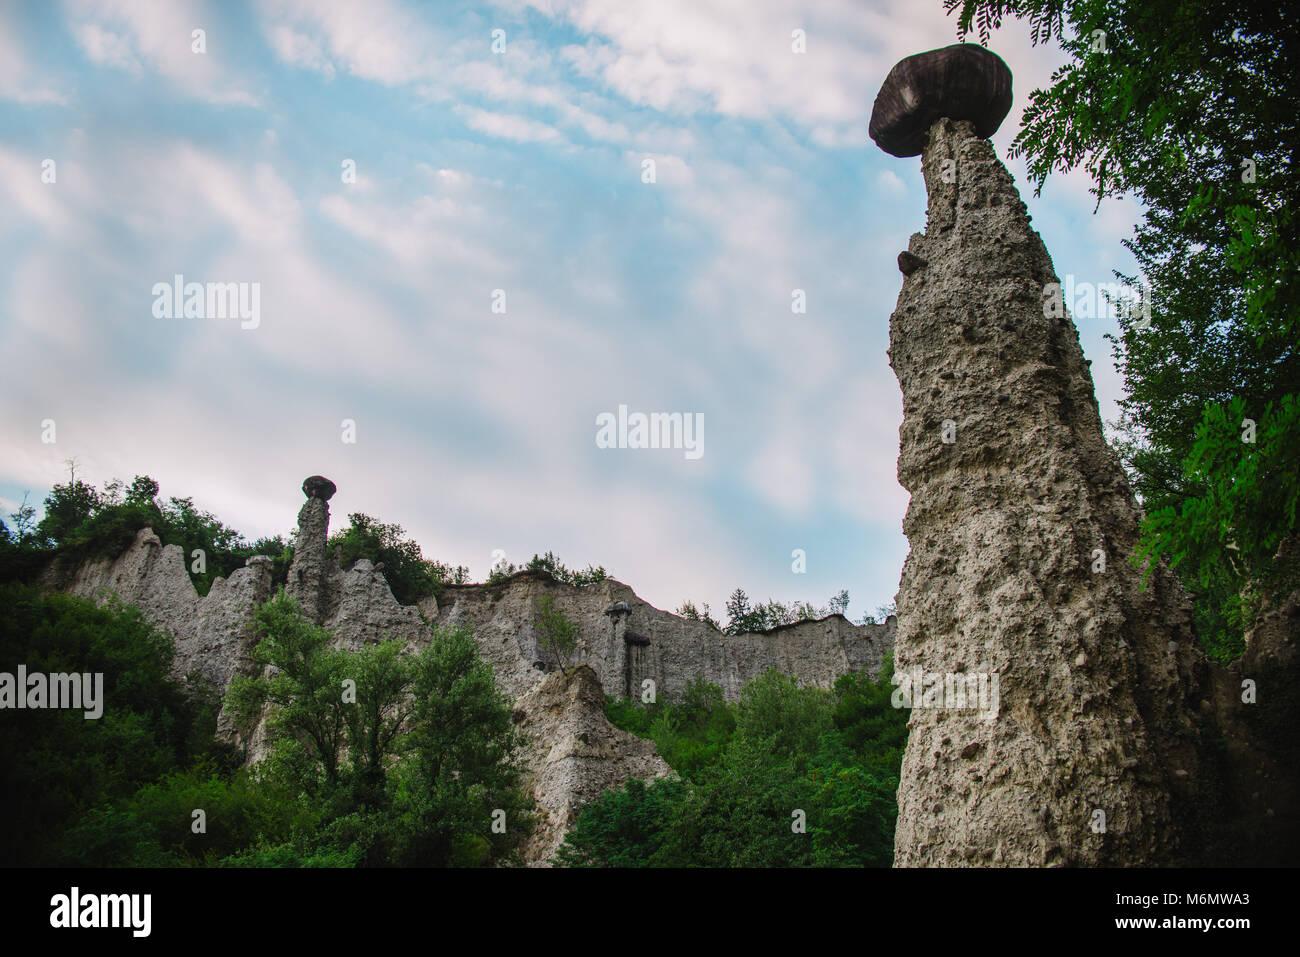 Piramide Zone in Italy, Lake Iseo - Stock Image